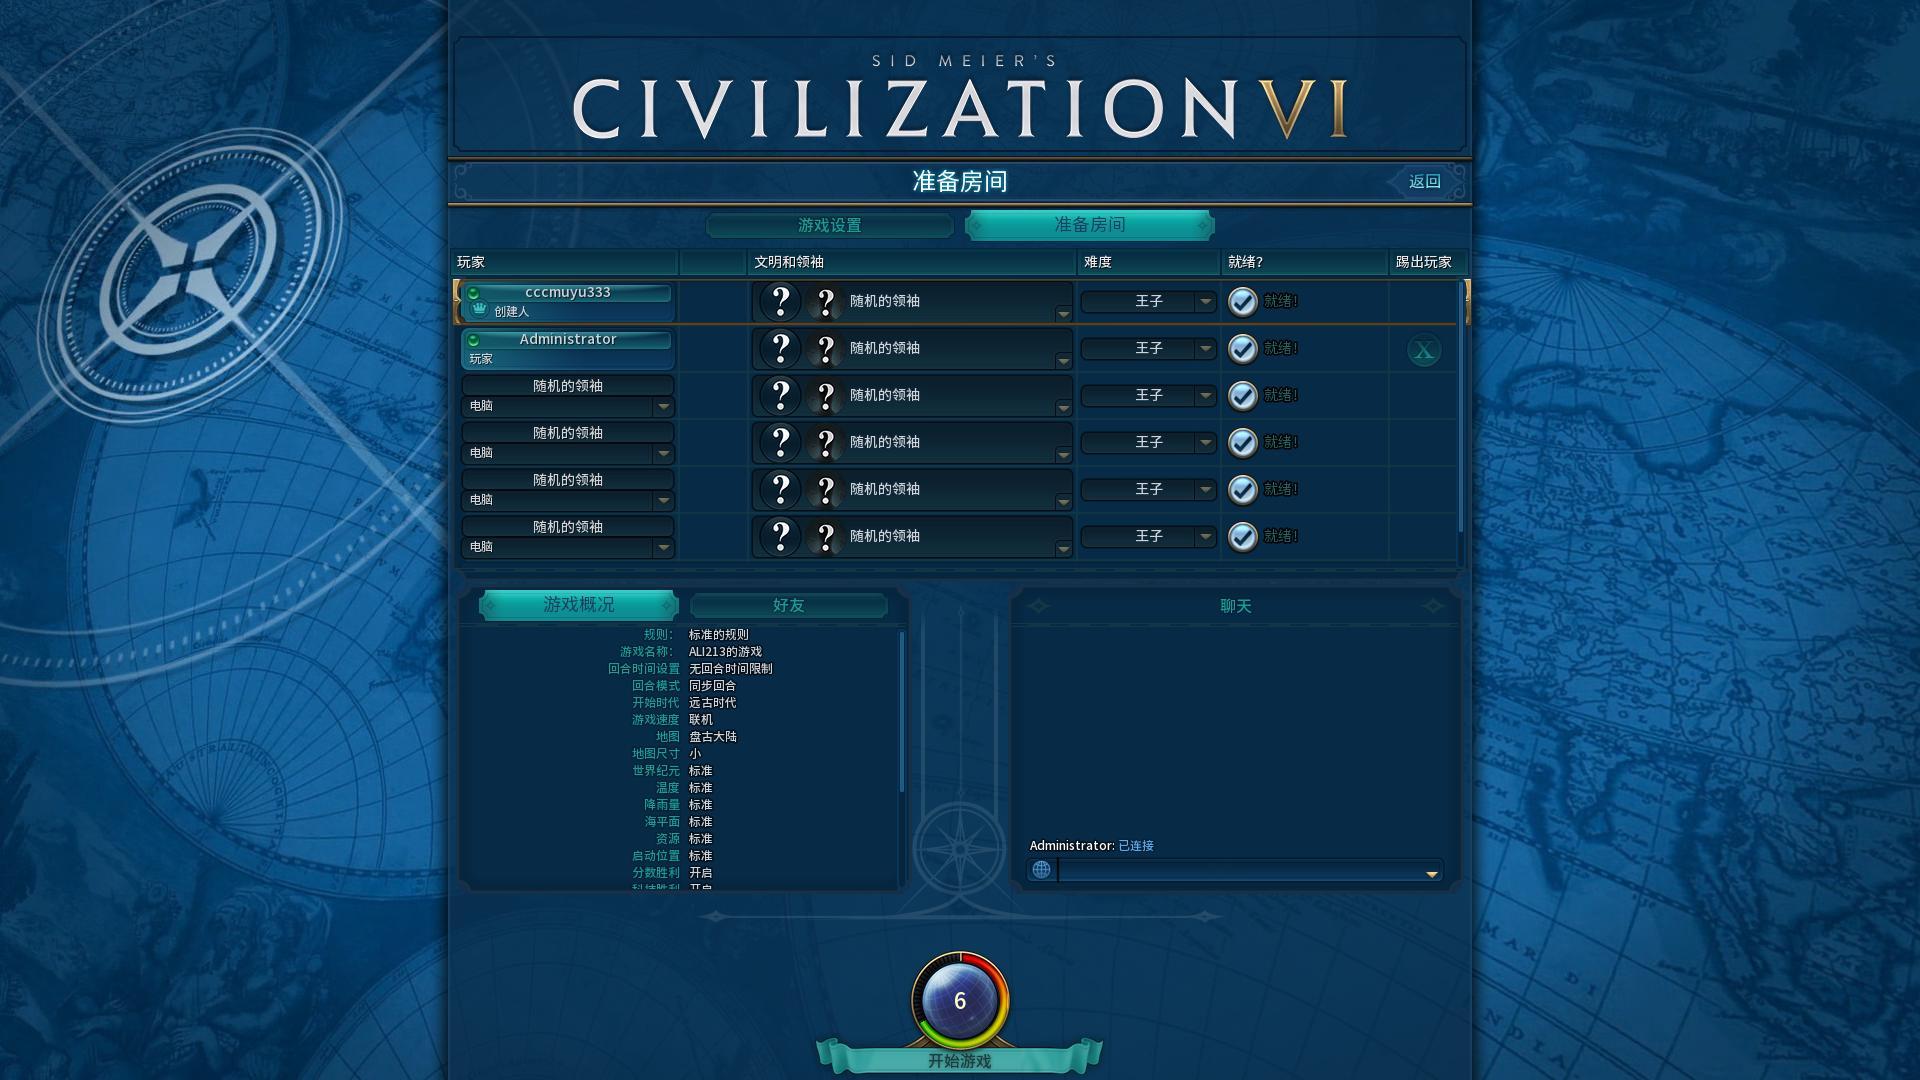 CivilizationVI 2016-10-21 15-07-10-82.jpg